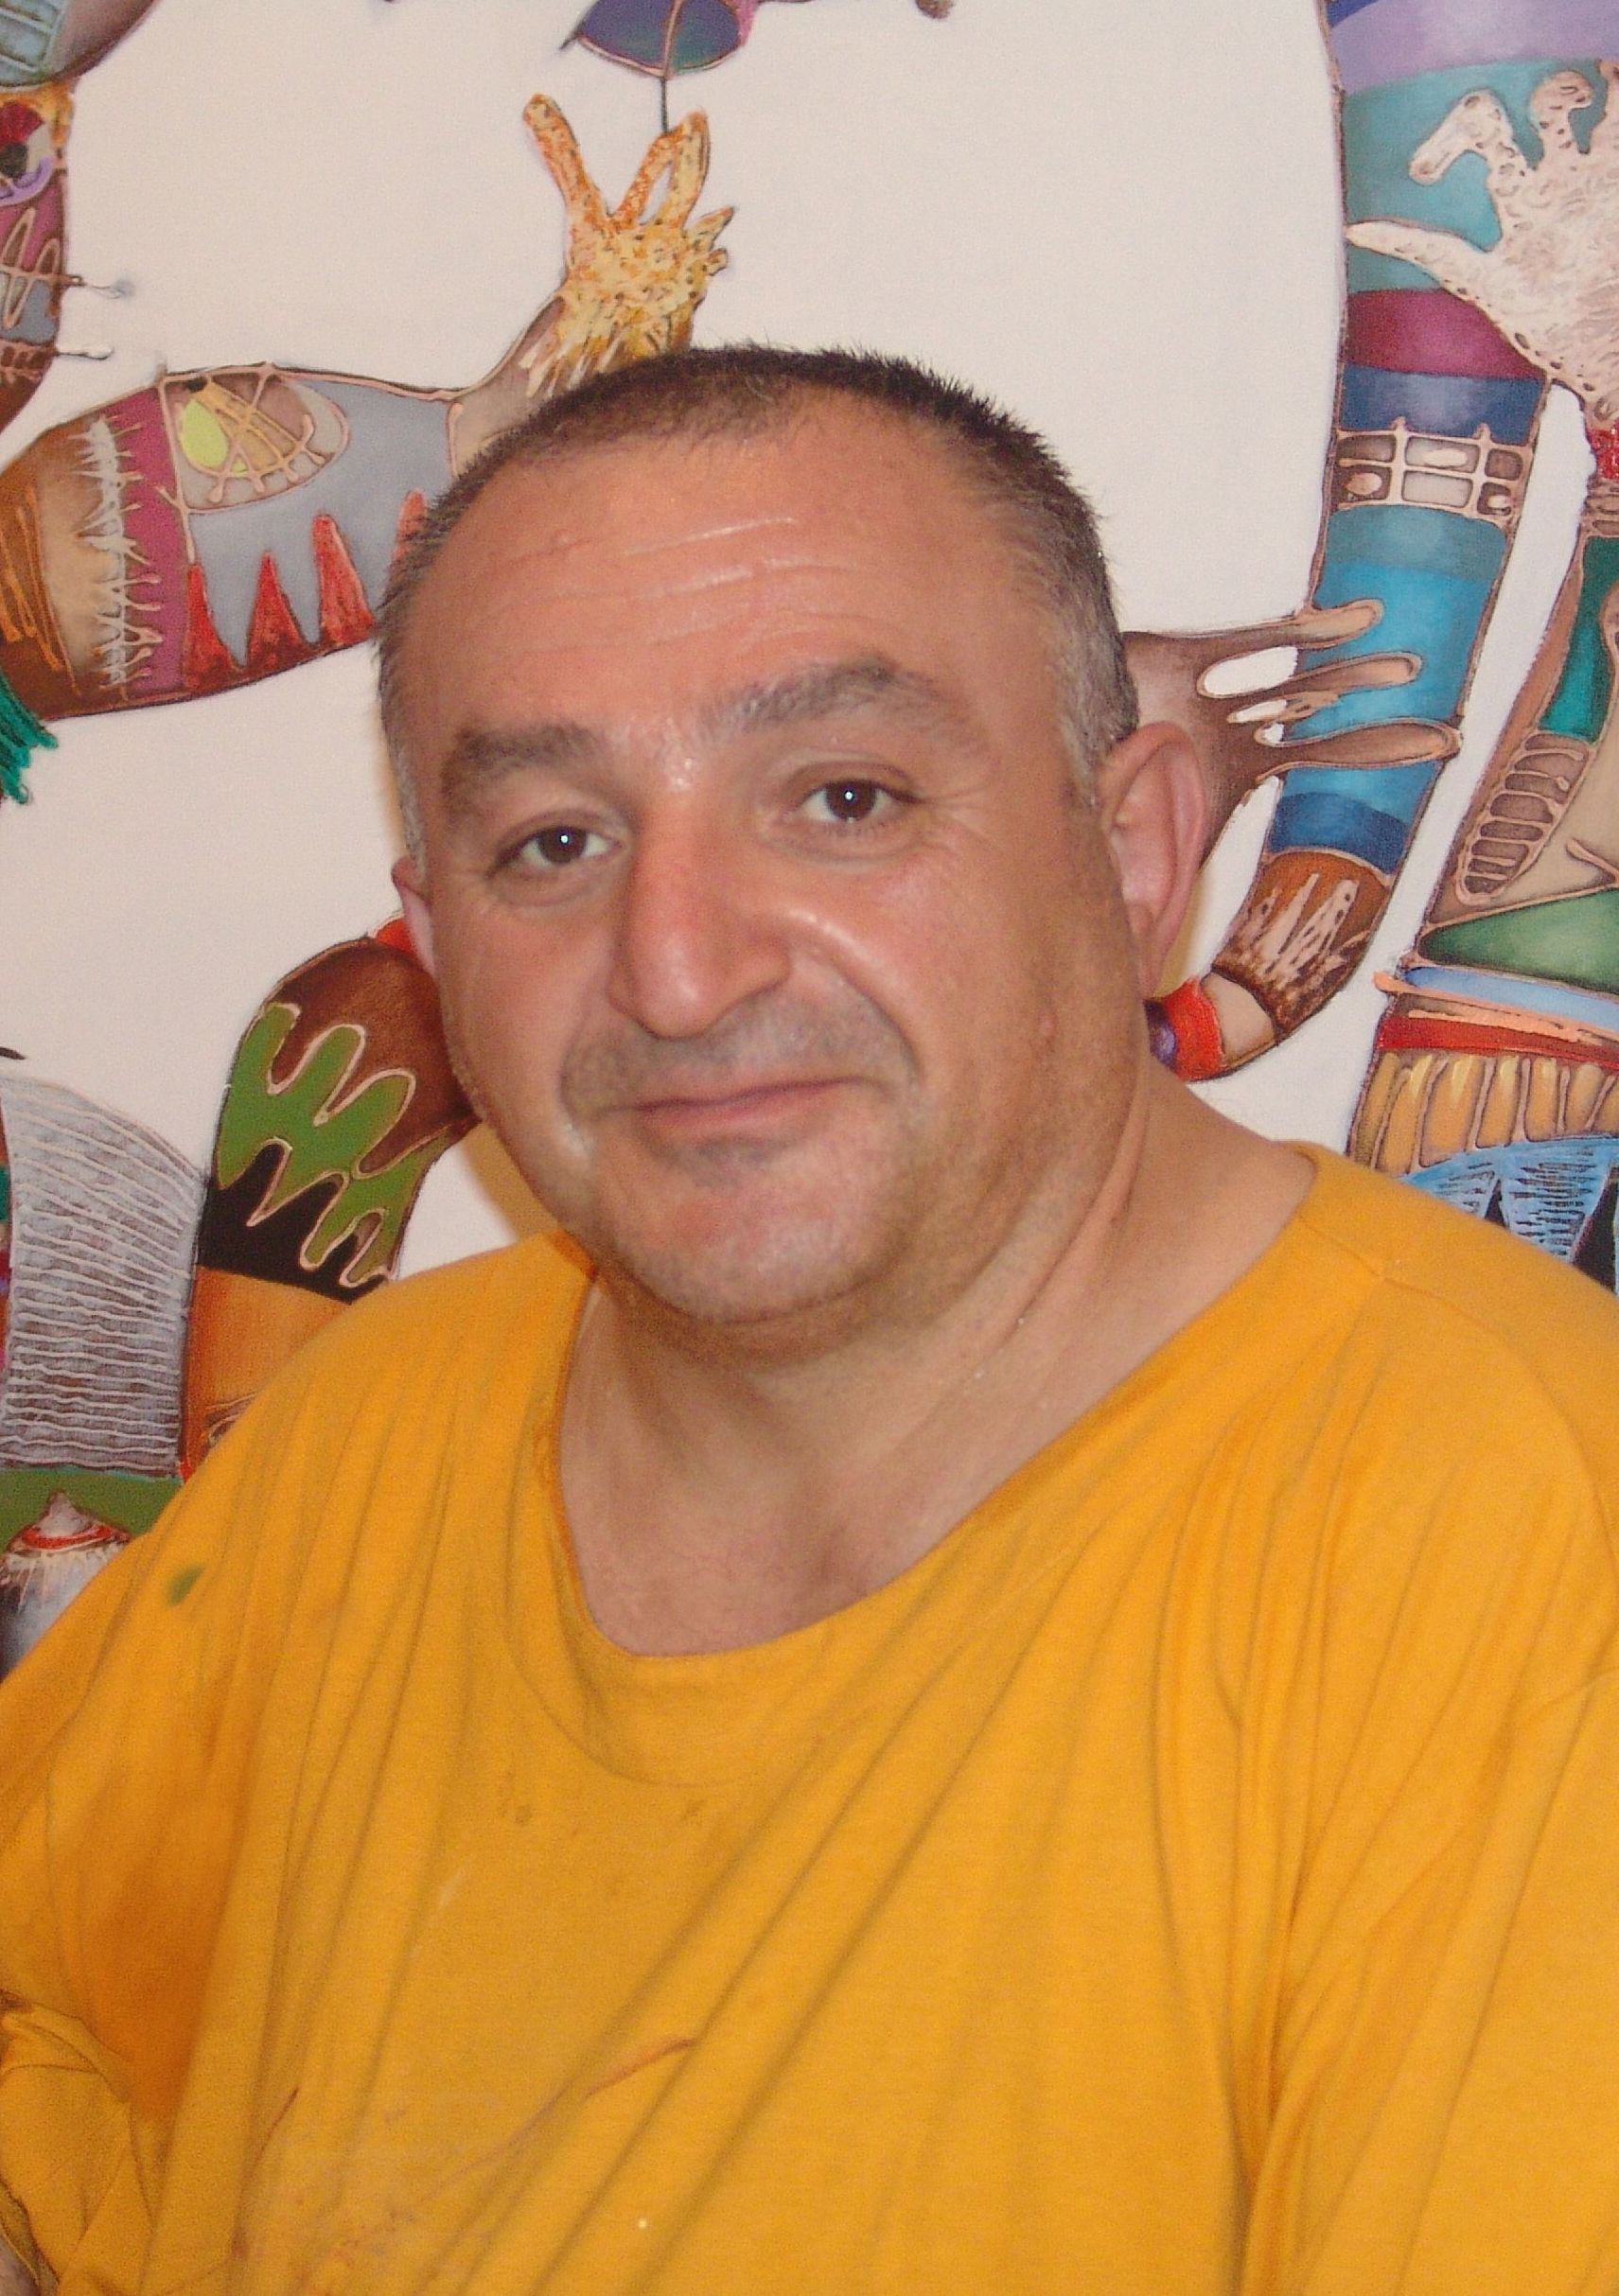 GABO (GABRIEL MANOUKIAN)